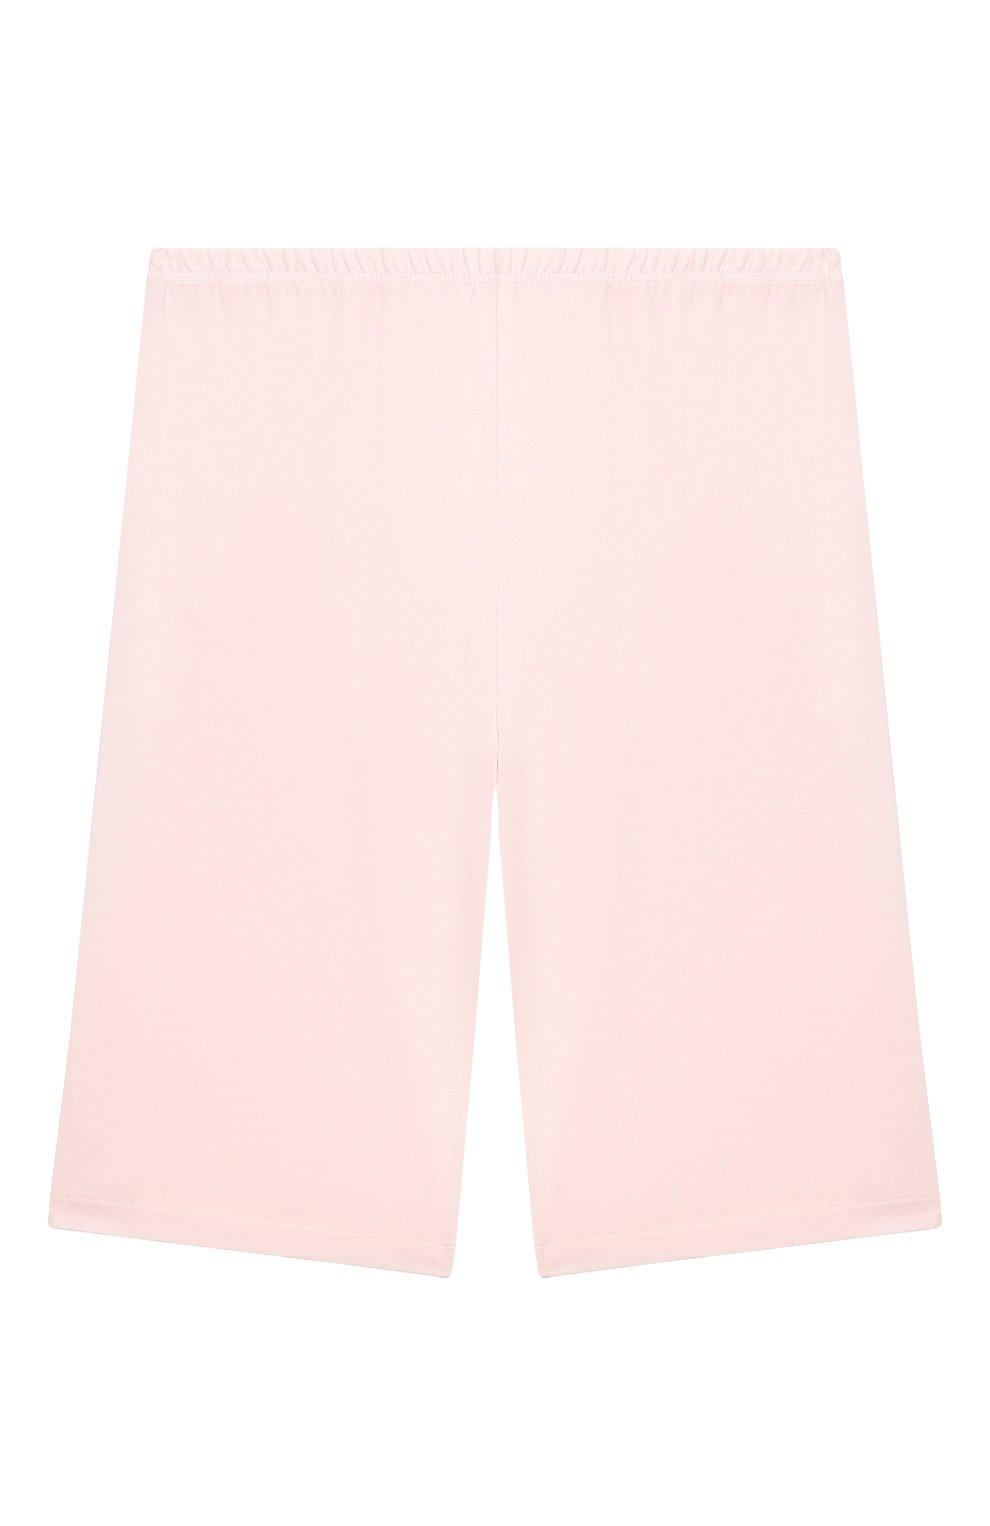 Детская пижама LA PERLA розового цвета, арт. 70151/2A-6A | Фото 4